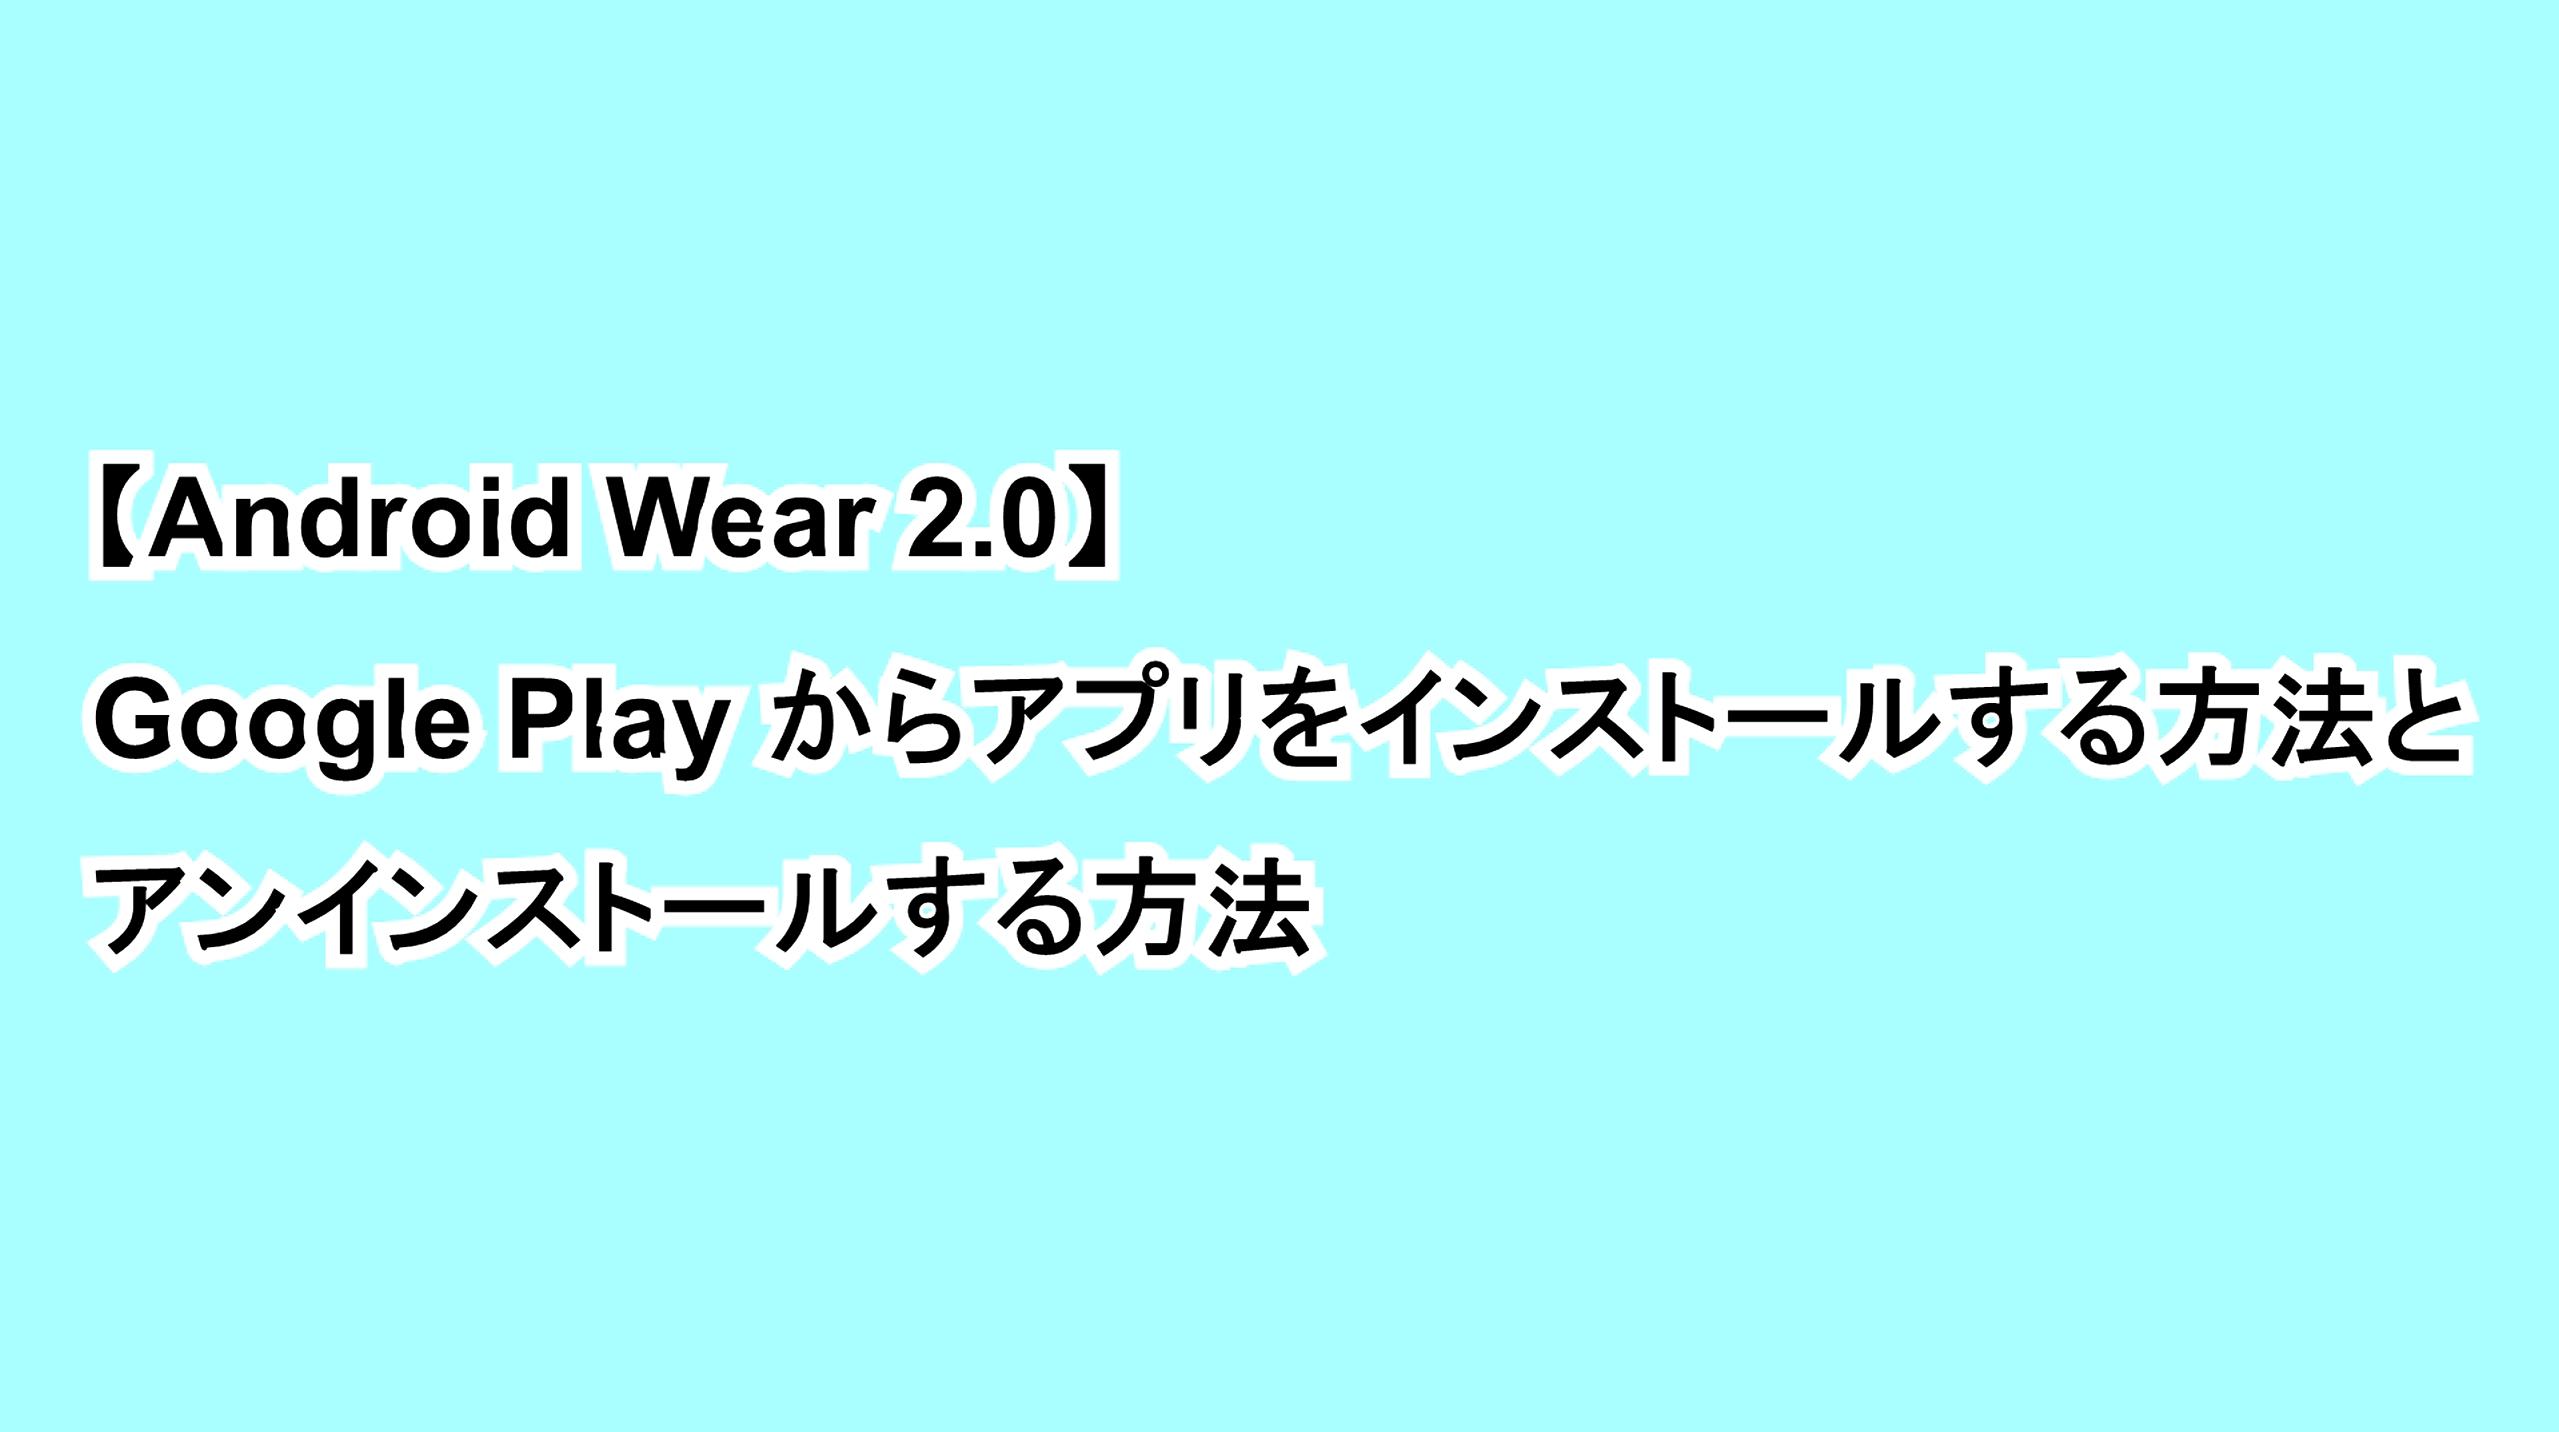 【Android Wear 2.0】Google Playからアプリをインストールする方法とアンインストールする方法